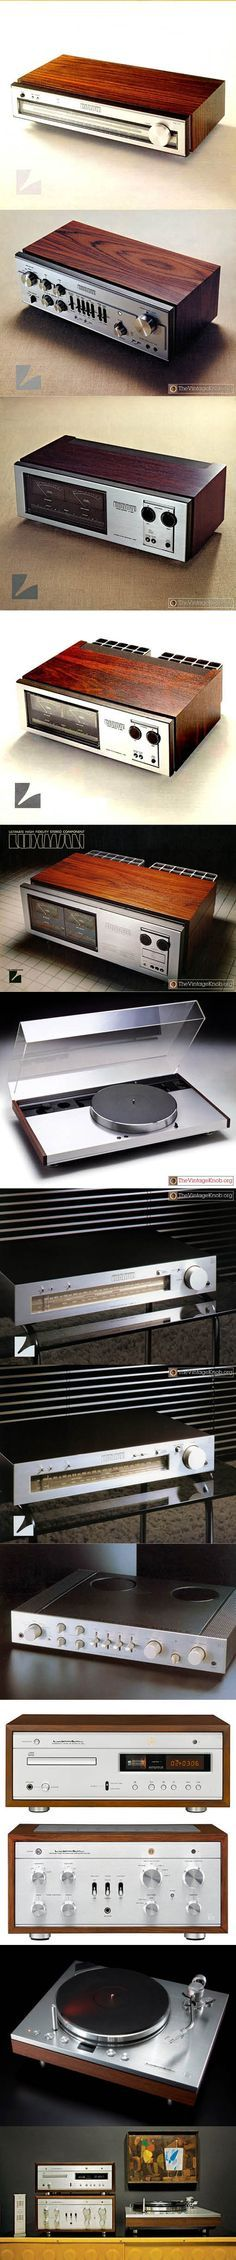 Luxman / 1975 T-110 tuner / C-1000 pre amplifier / M-2000 / M-4000 / M-6000 power amplifier / 1977 PD444 turntable / 1978 T-2 / T-4 tuner / 2010 D-38u tube CD-player / SQ-30u integrated amplifier / PD-171 turntable / Japan / aluminium wood